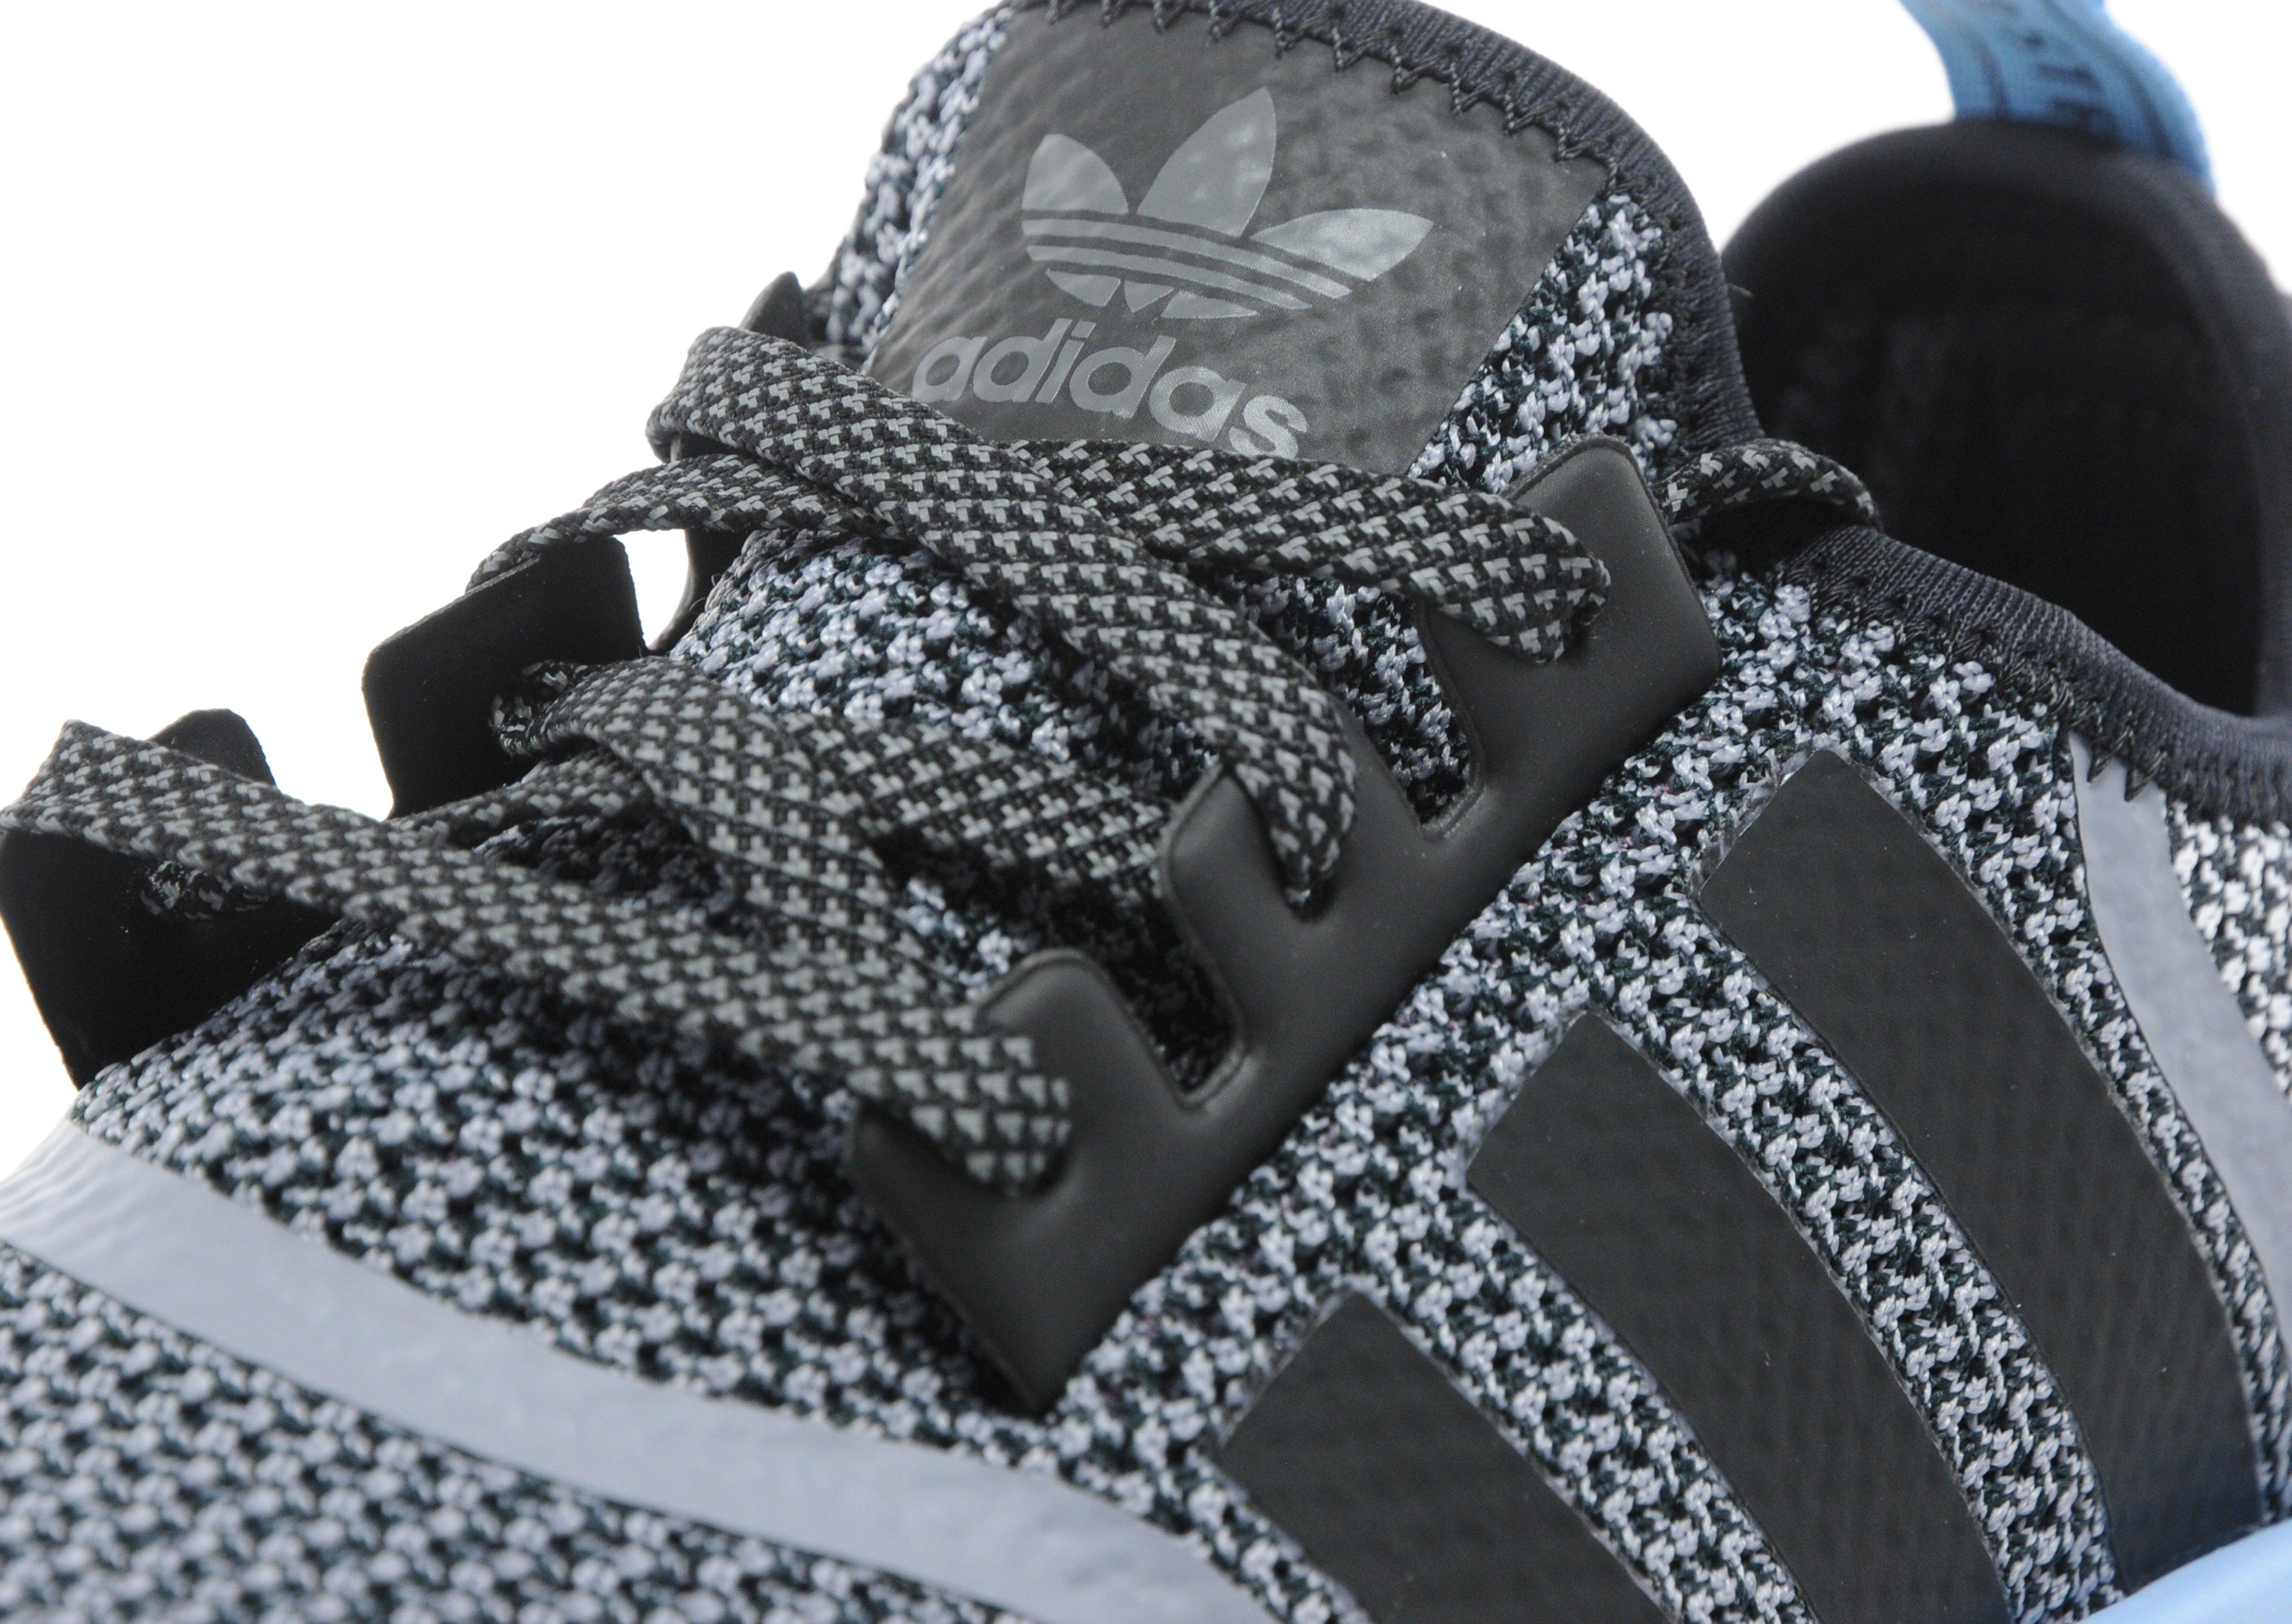 Nmd Adidas Argentina